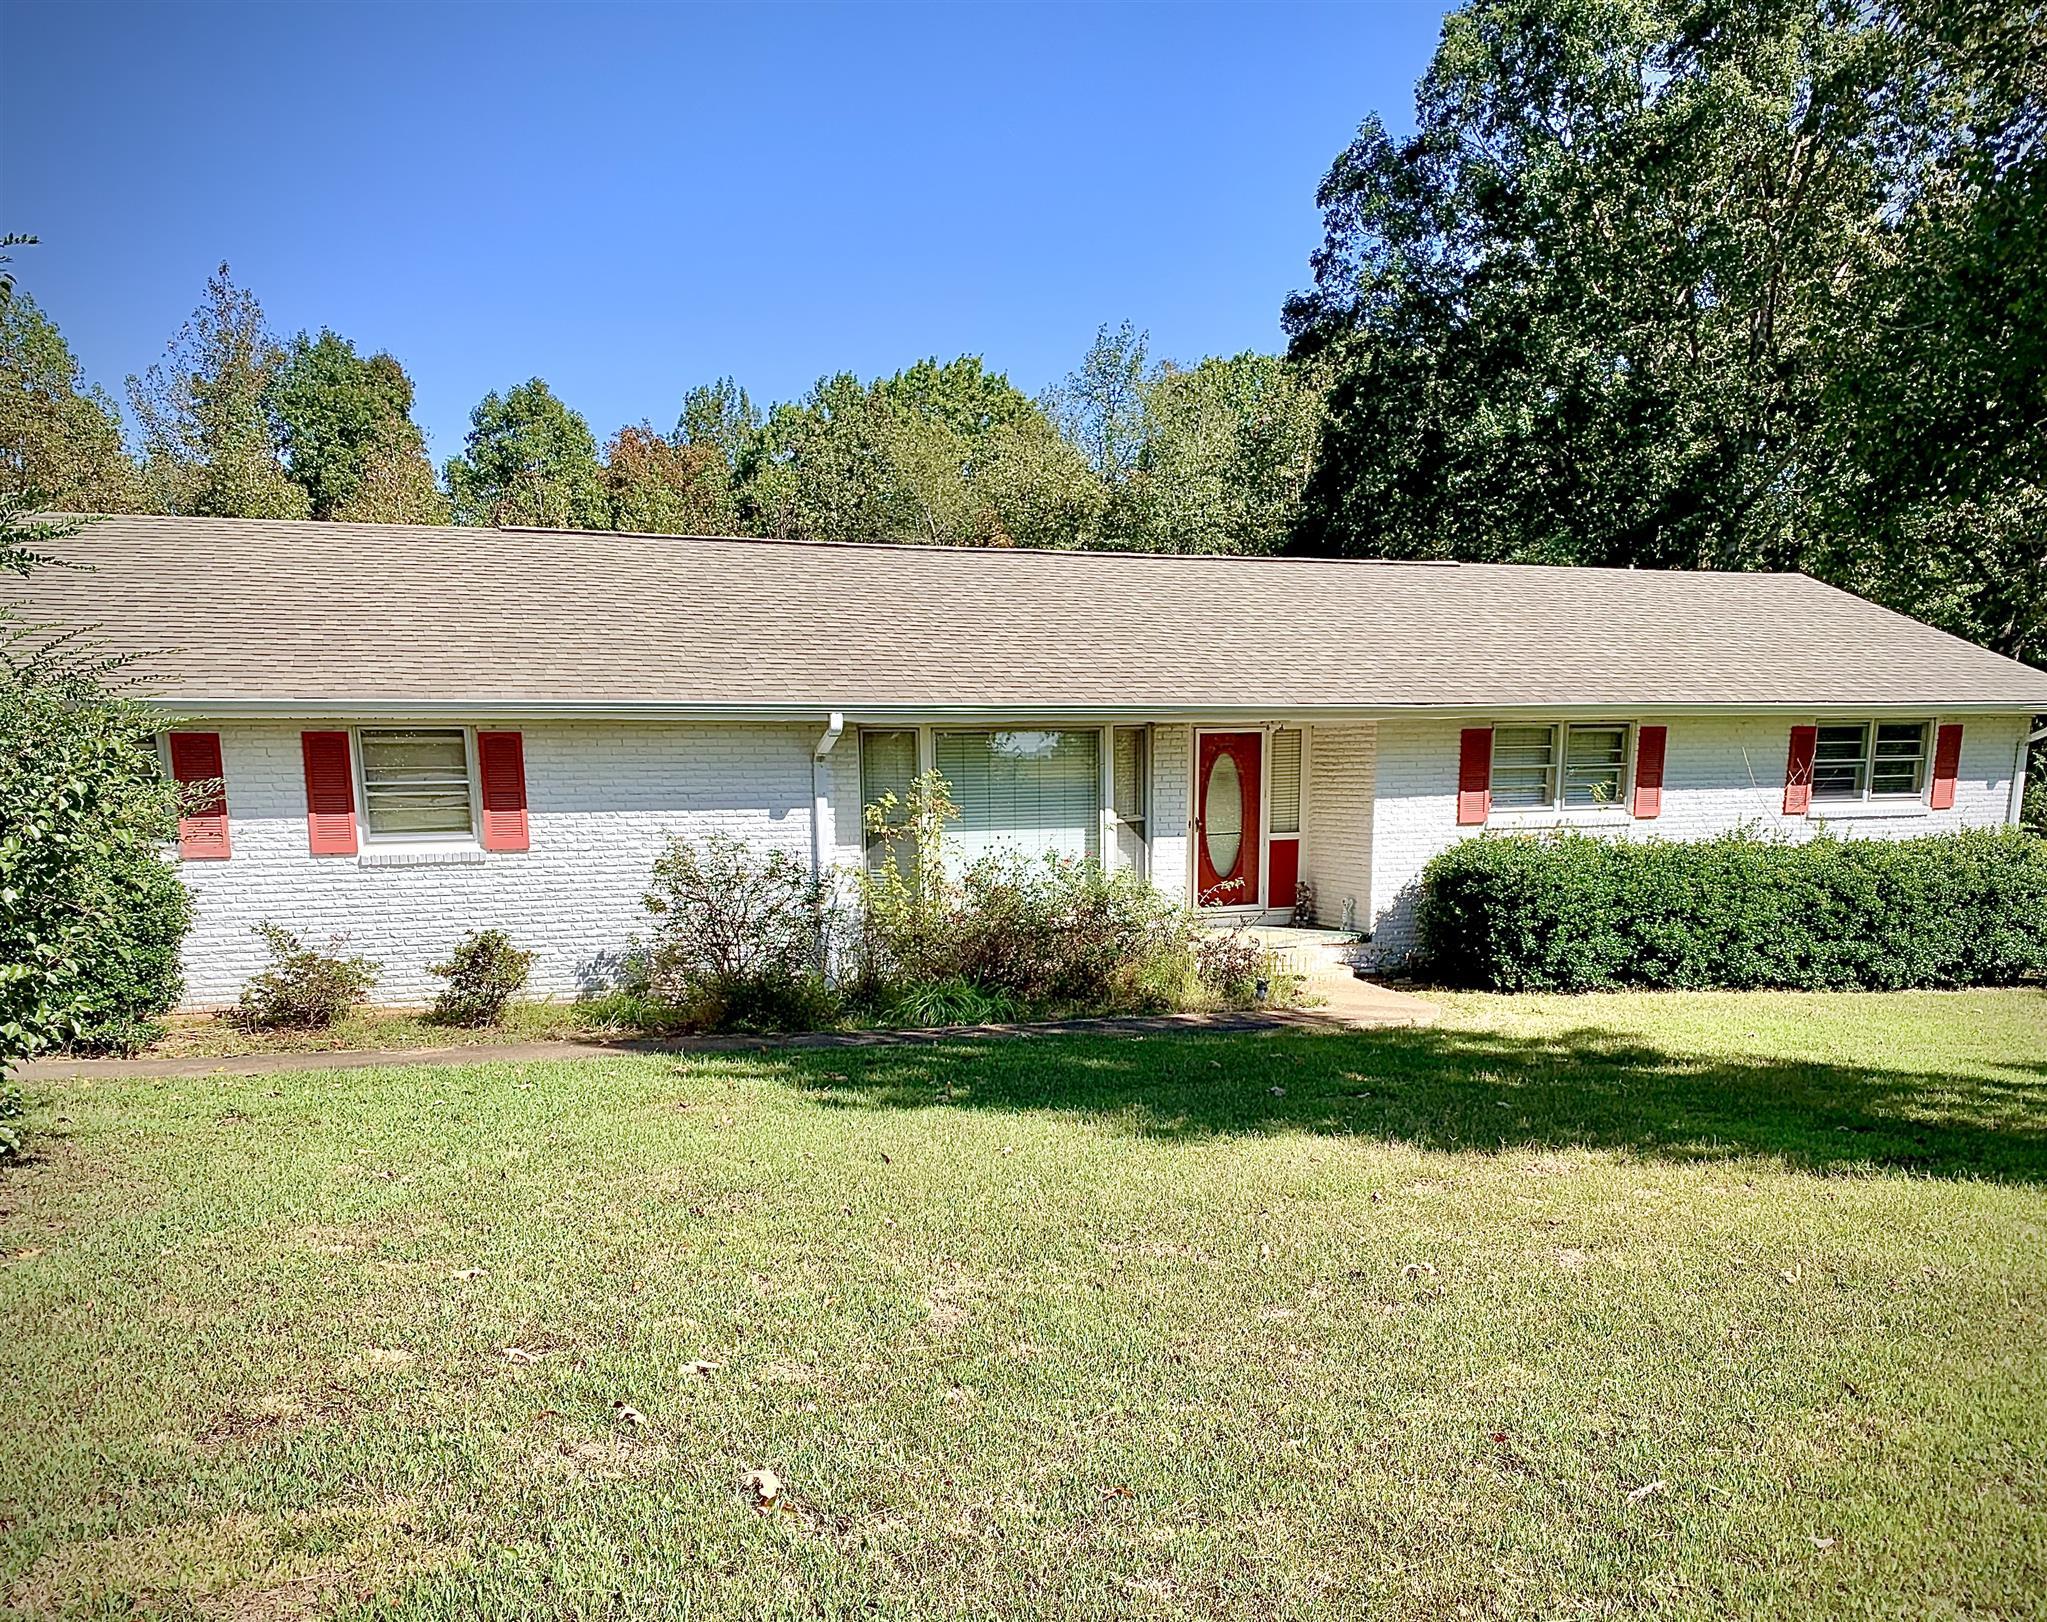 2715 Chisholm Rd, Iron City, TN 38463 - Iron City, TN real estate listing